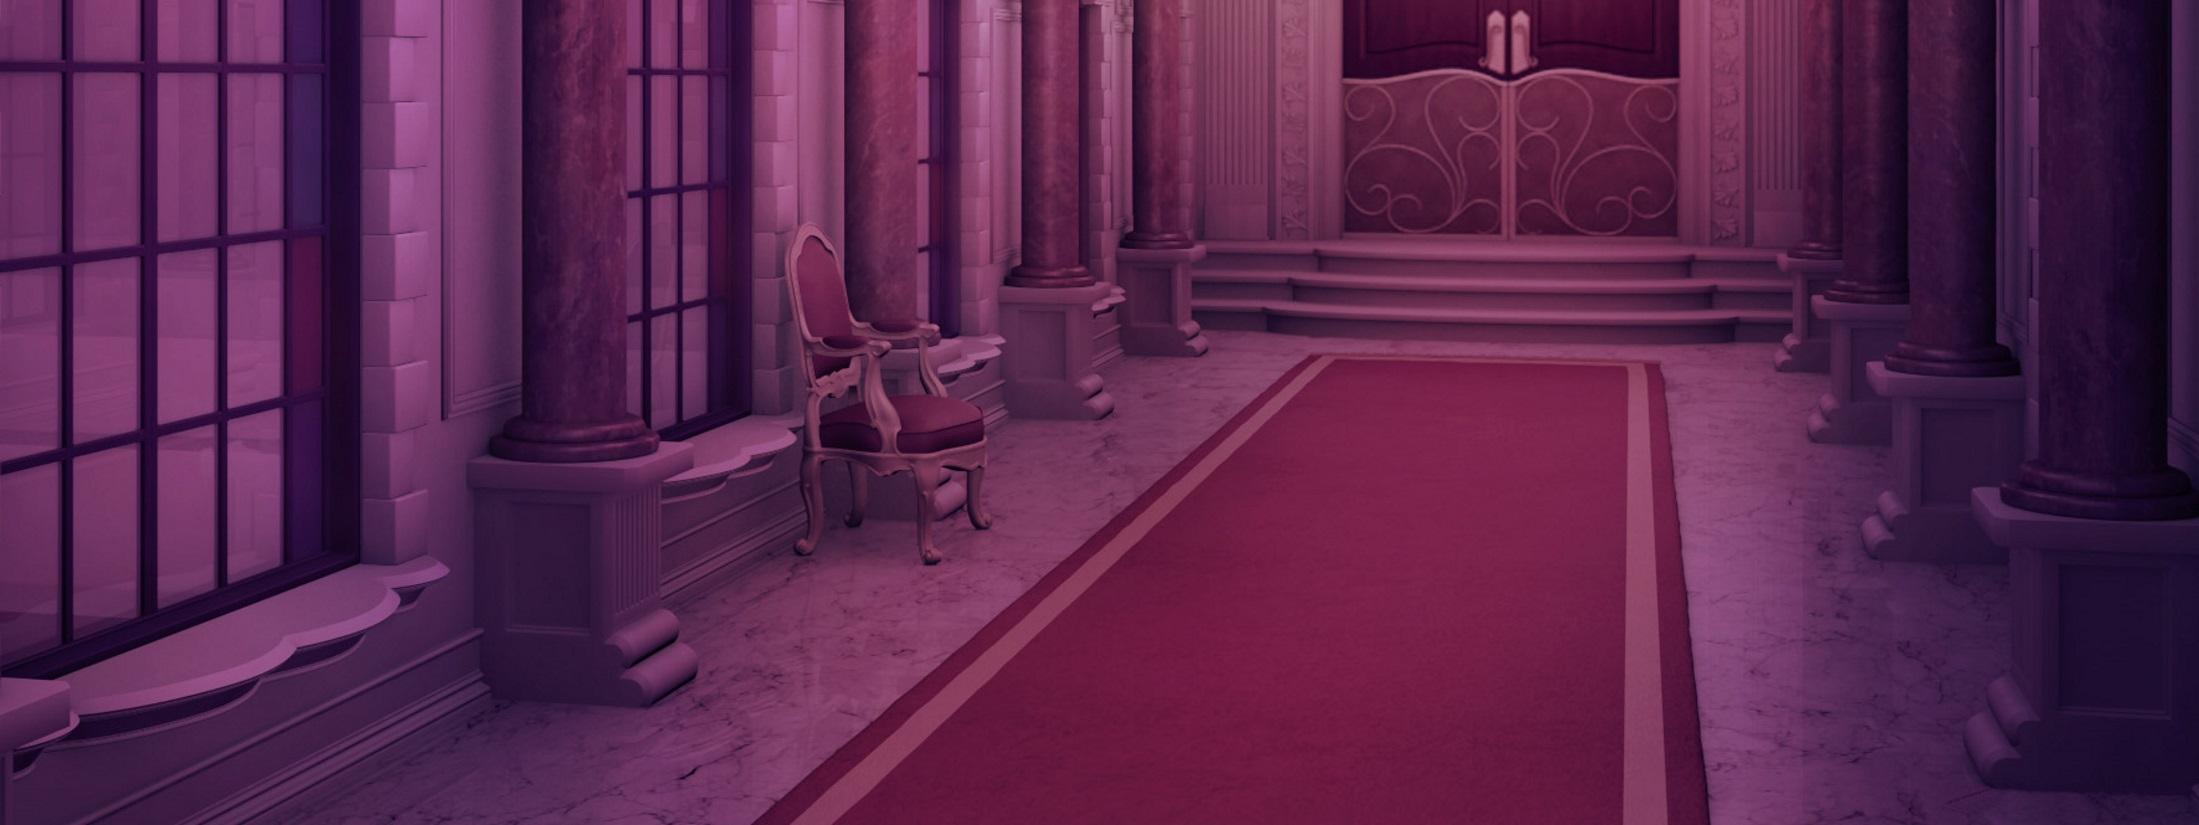 XL Background - Corridor 02.jpg